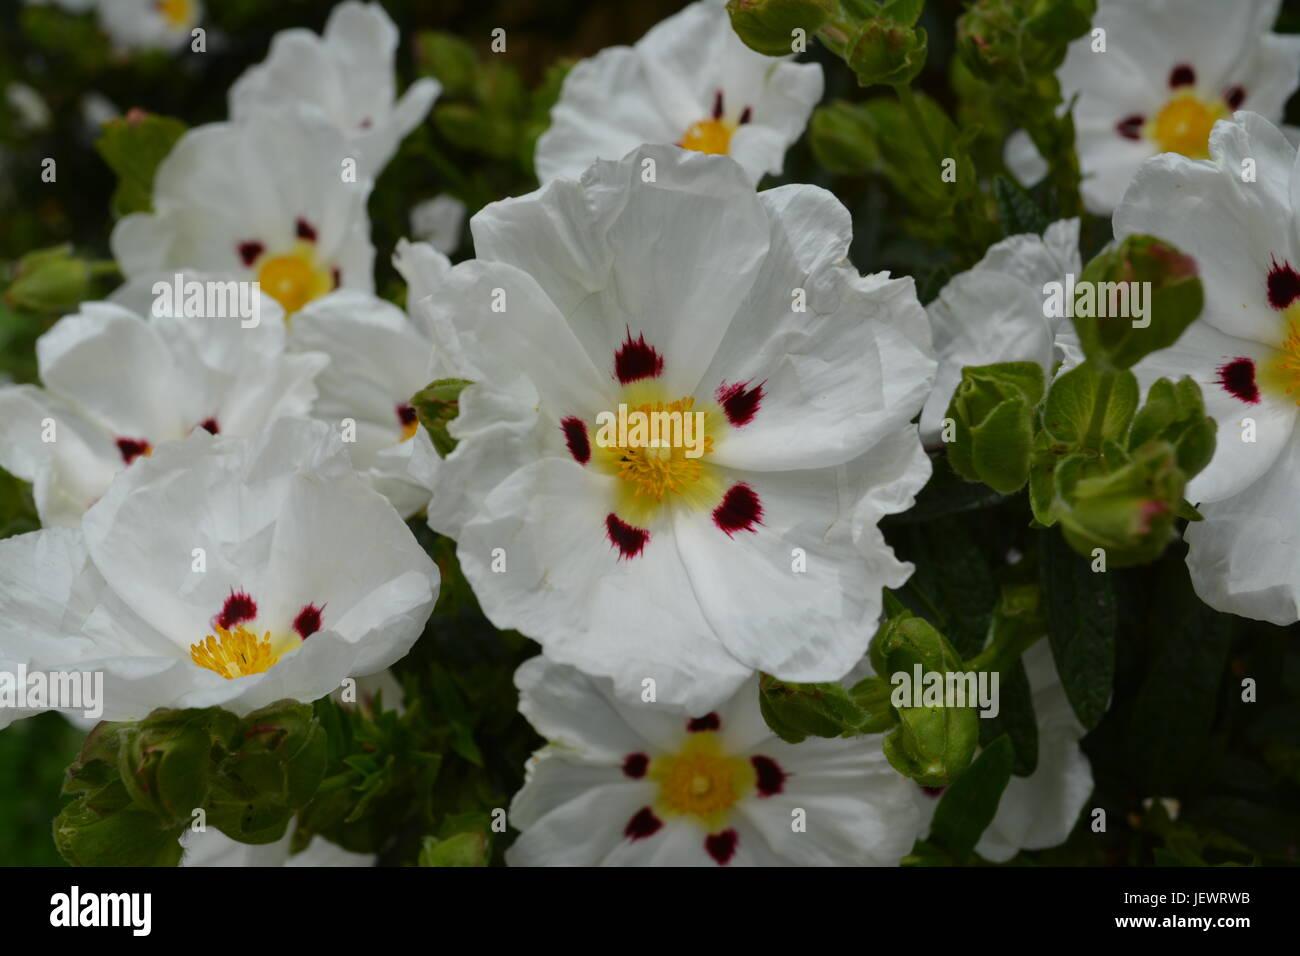 White flower five petals yellow stock photos white flower five close up of white red and yellow garden flower rock rose rockrose in bloom stock mightylinksfo